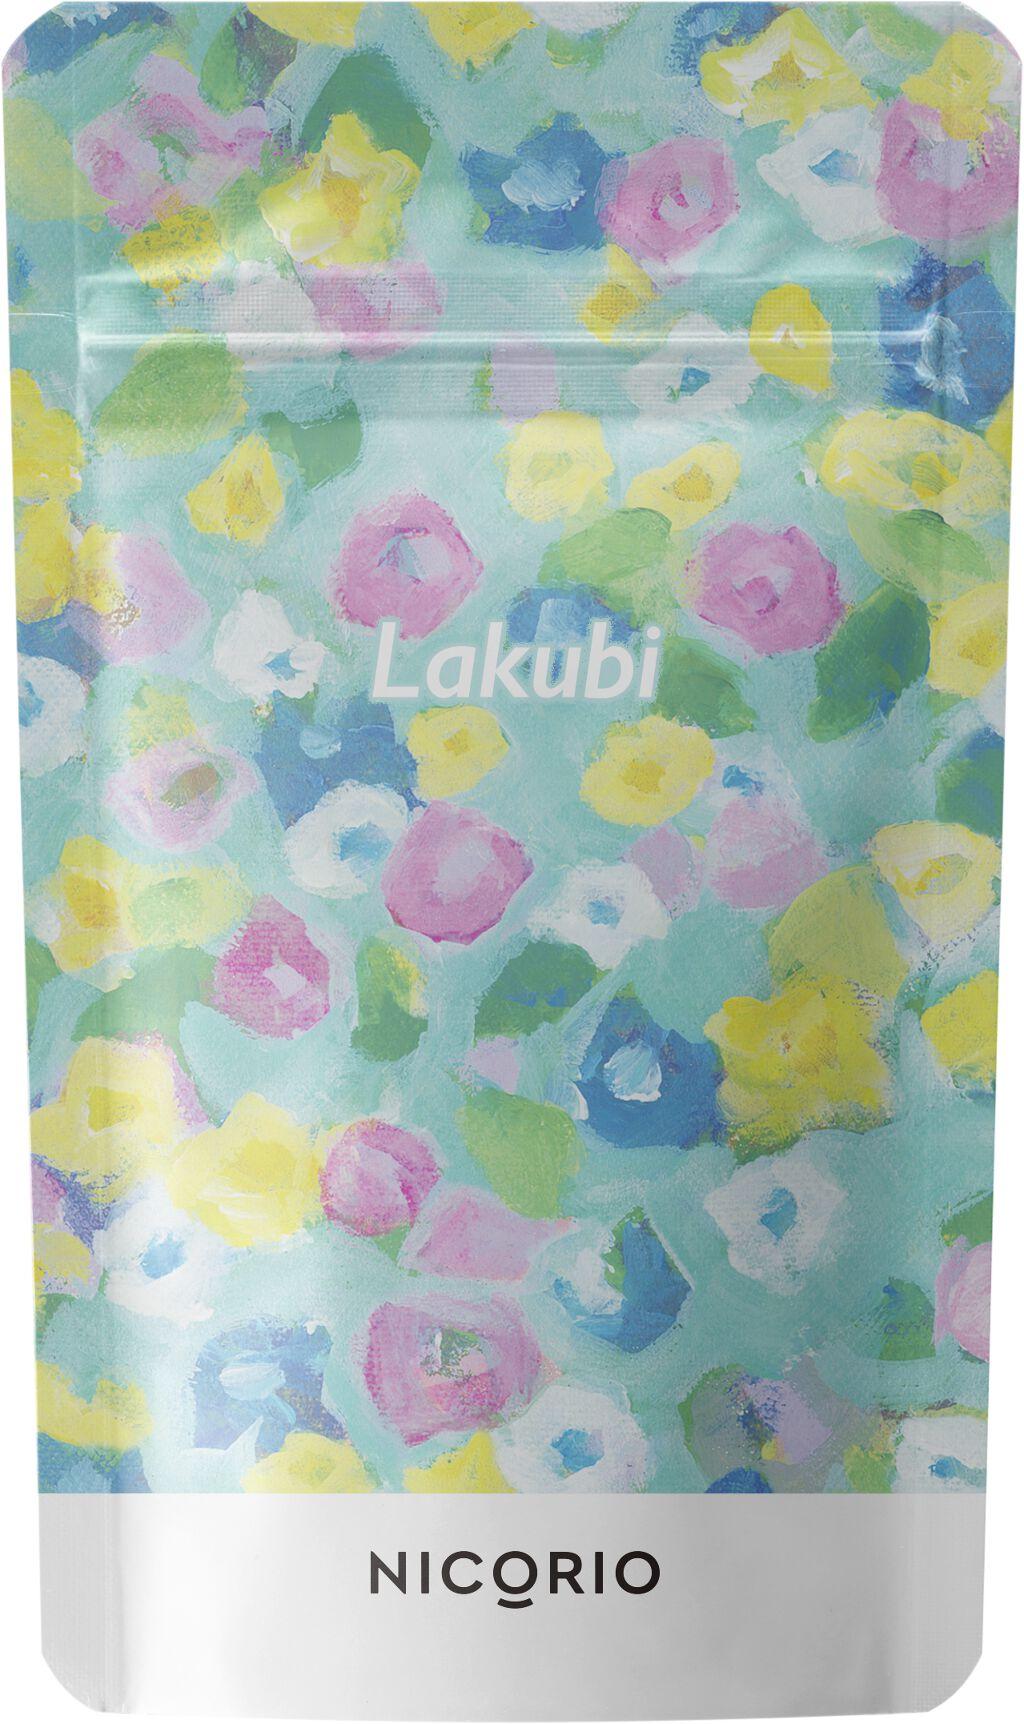 Lakubi(ラクビ) NICORIO